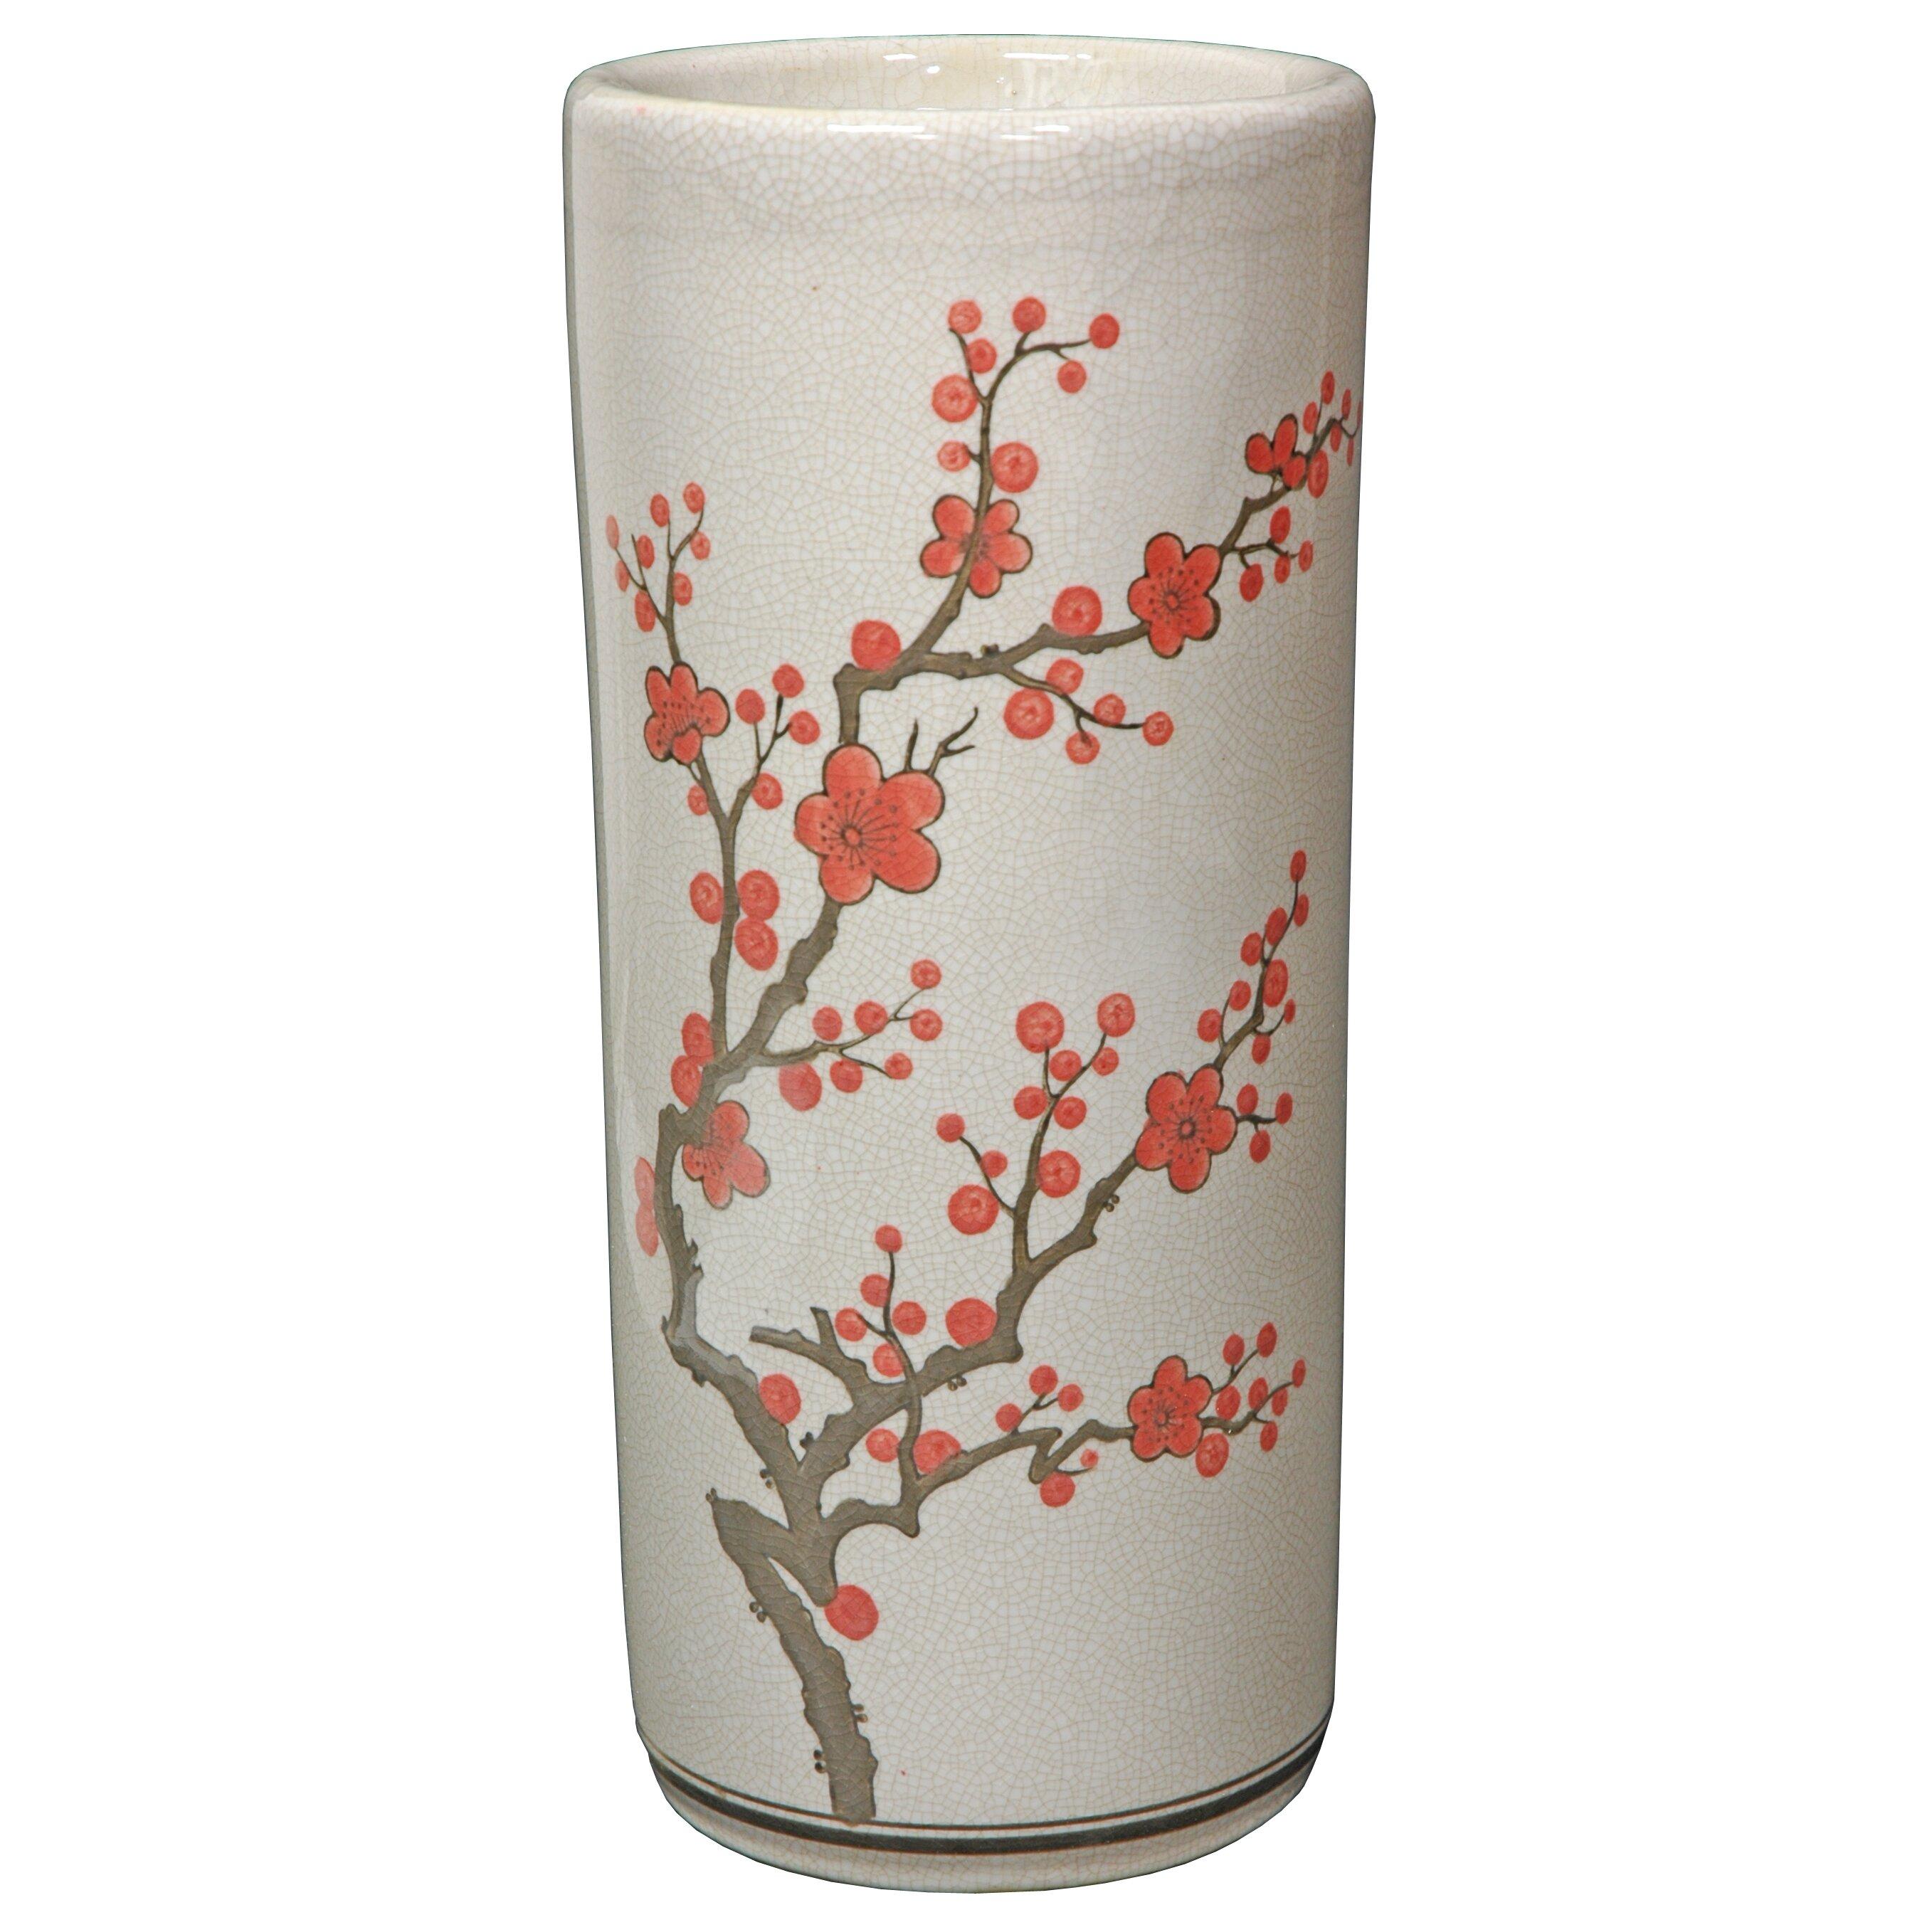 Umbrella Stand Wayfair: Oriental Furniture Cherry Blossom Umbrella Stand & Reviews